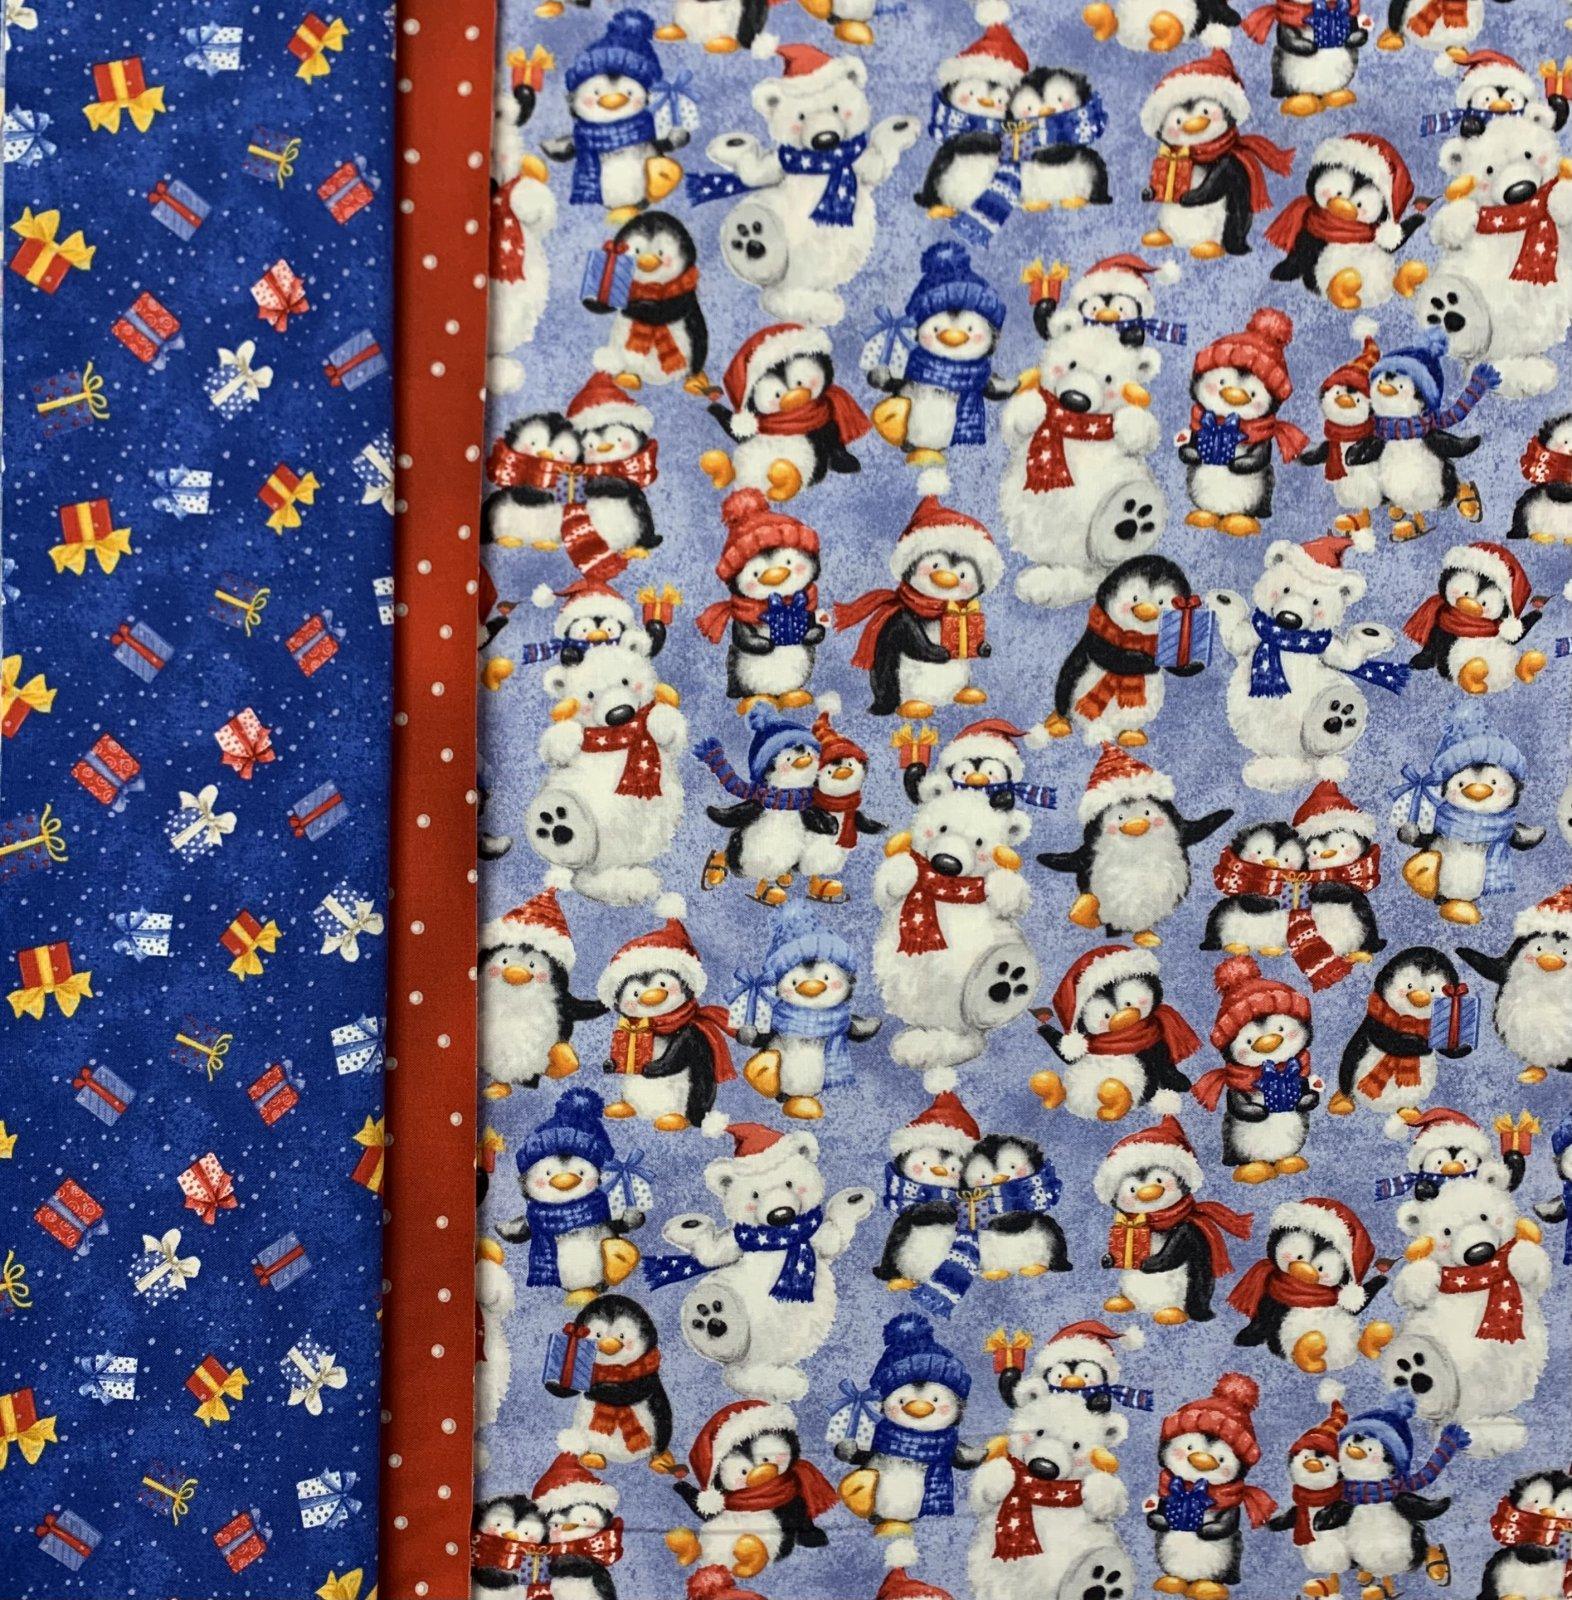 Snow What Fun Pillowcase Kit (Blue)